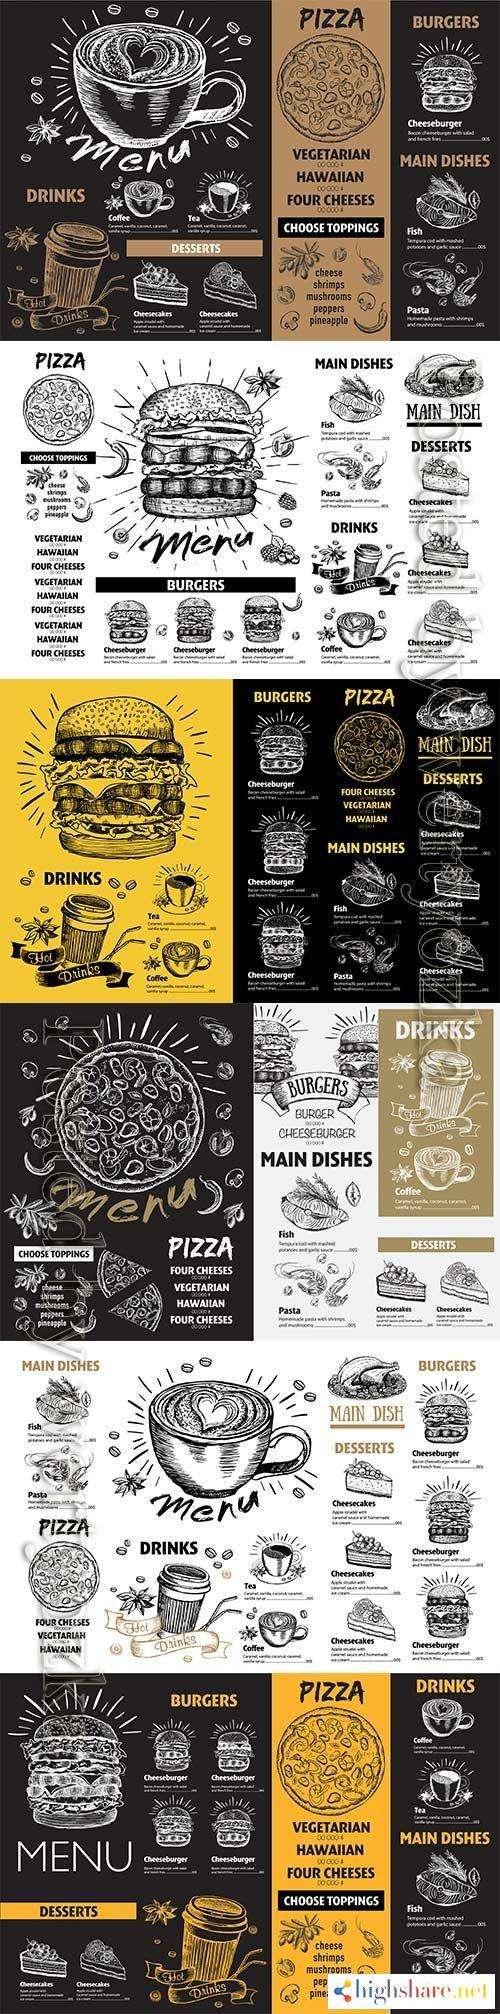 restaurant cafe menu template design 5f41feedac911 - Restaurant cafe menu, template design